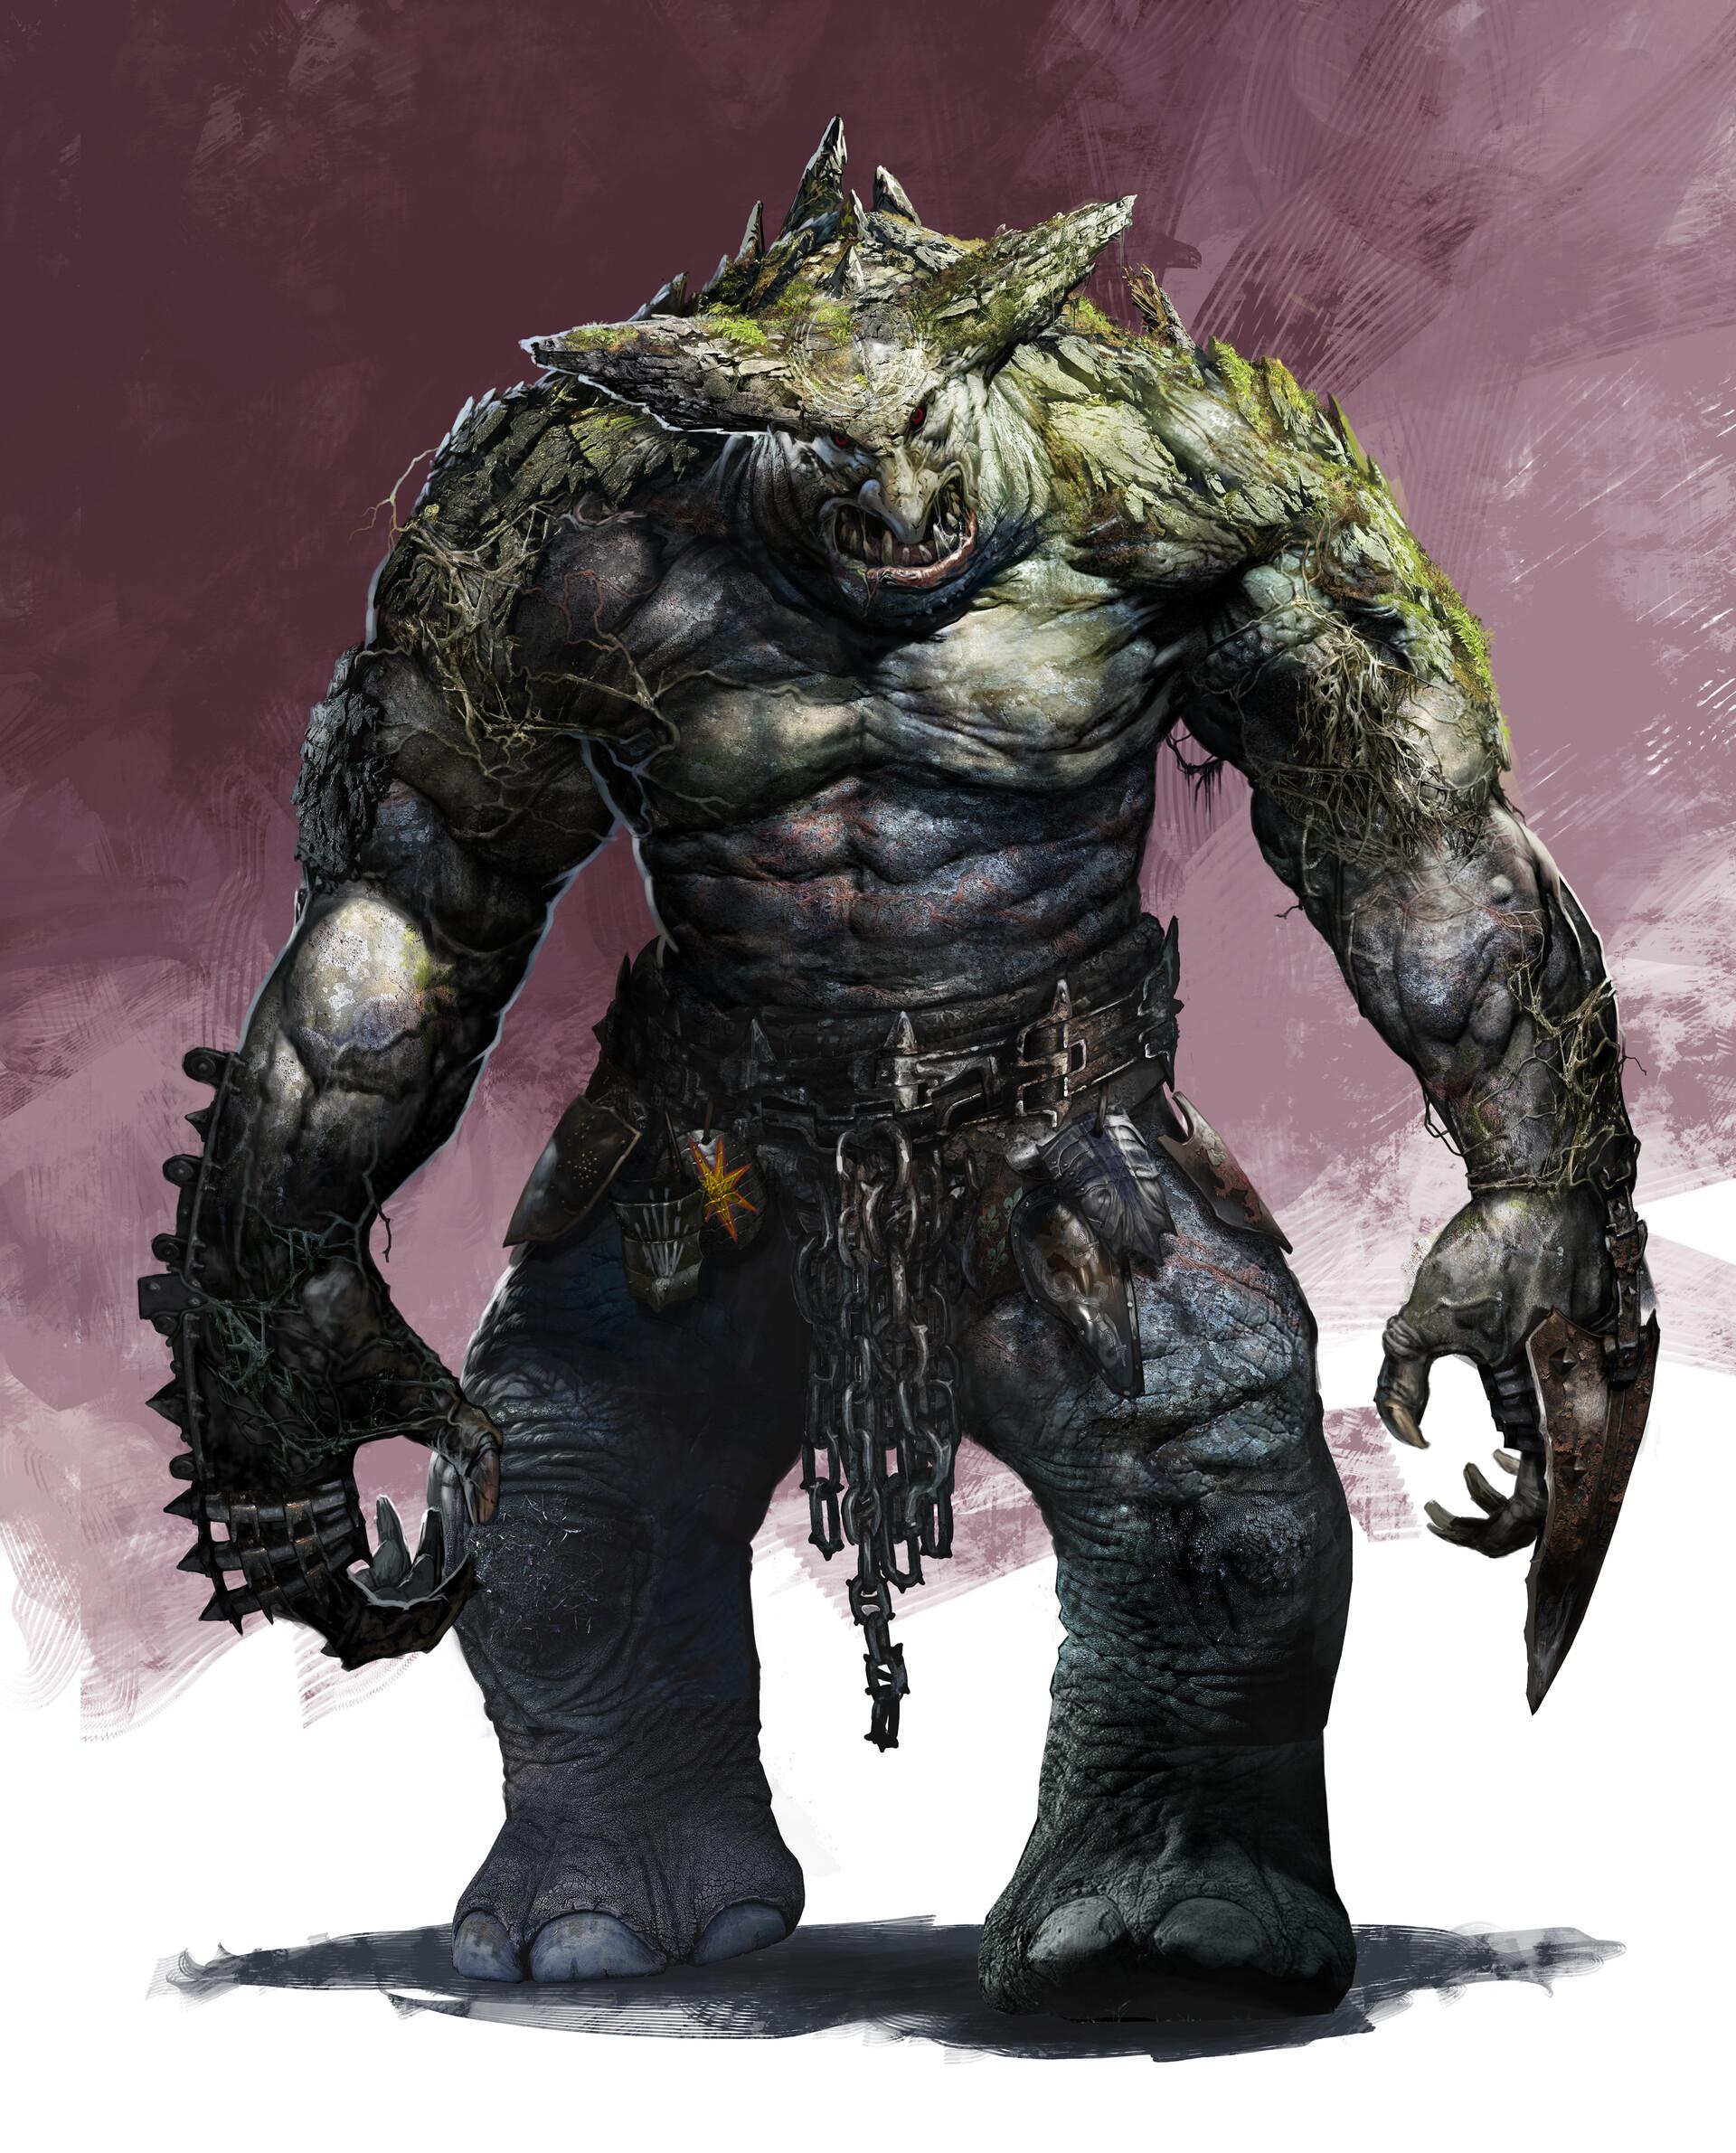 Jakub kuzma stone troll 4s